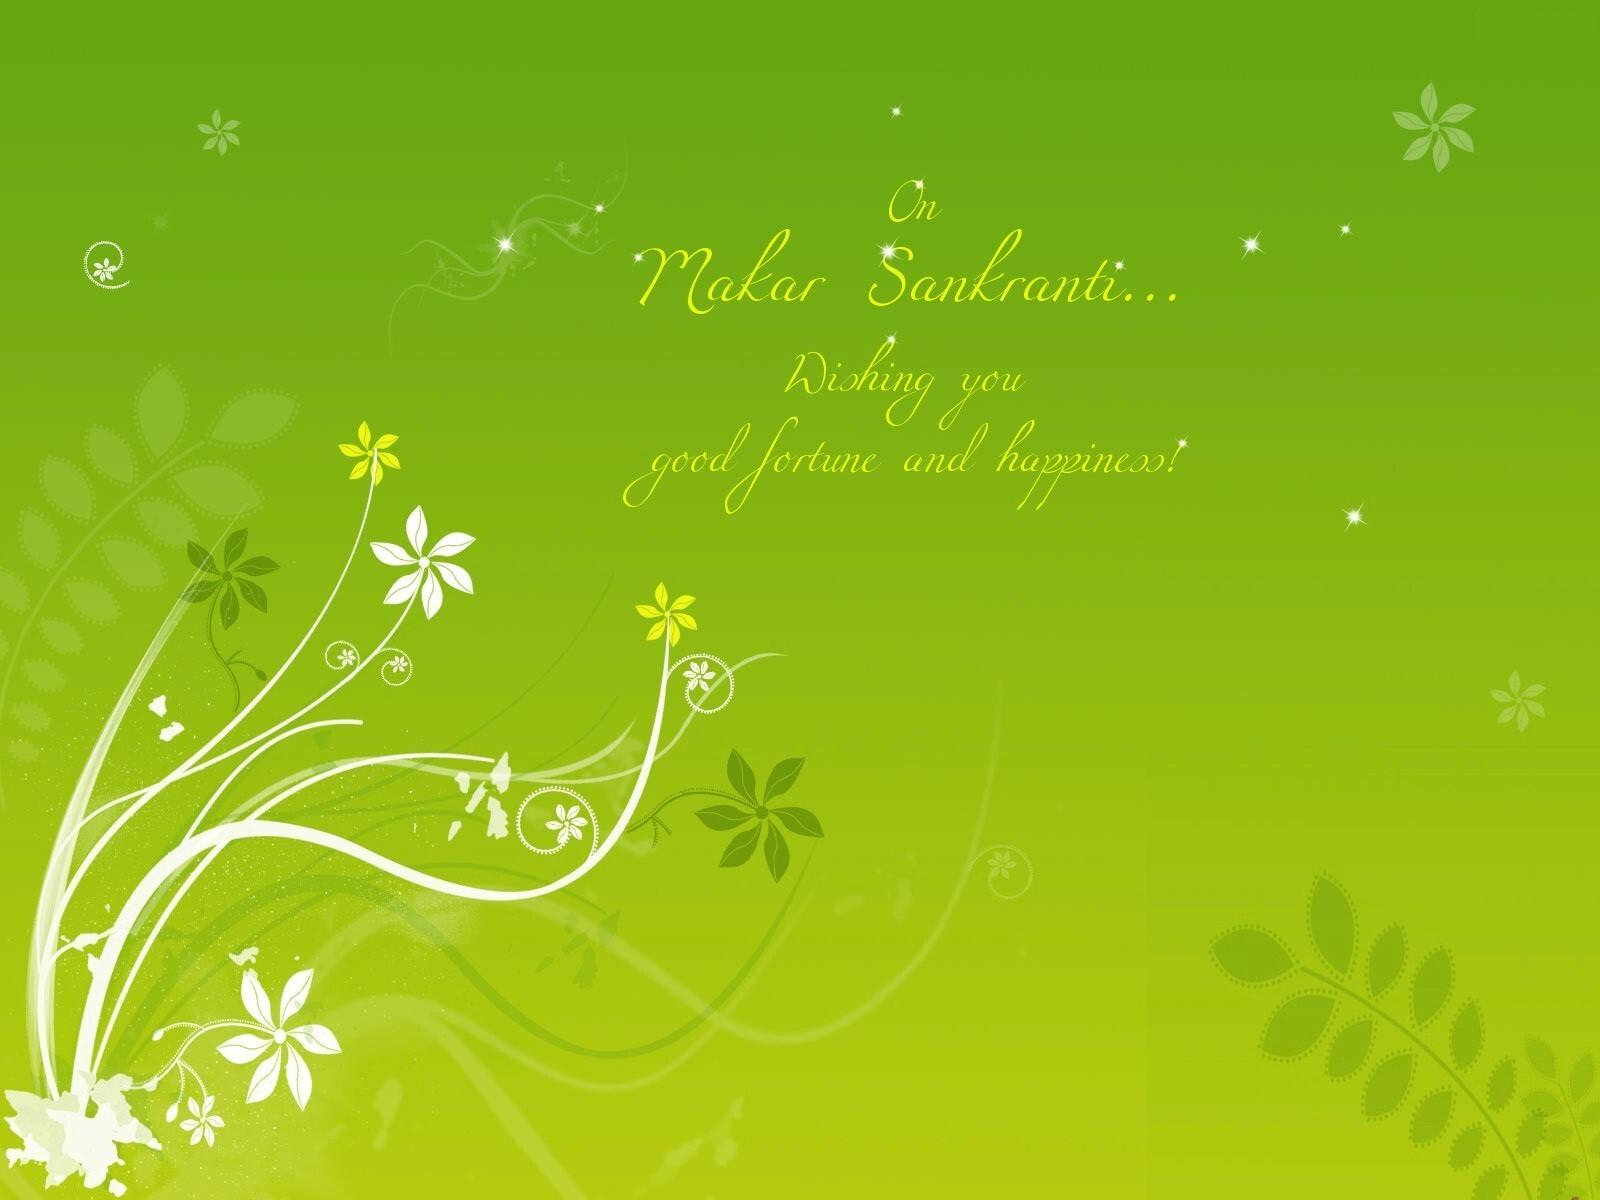 Makar Sankranti Wish In Green Background Hd Wallpapers